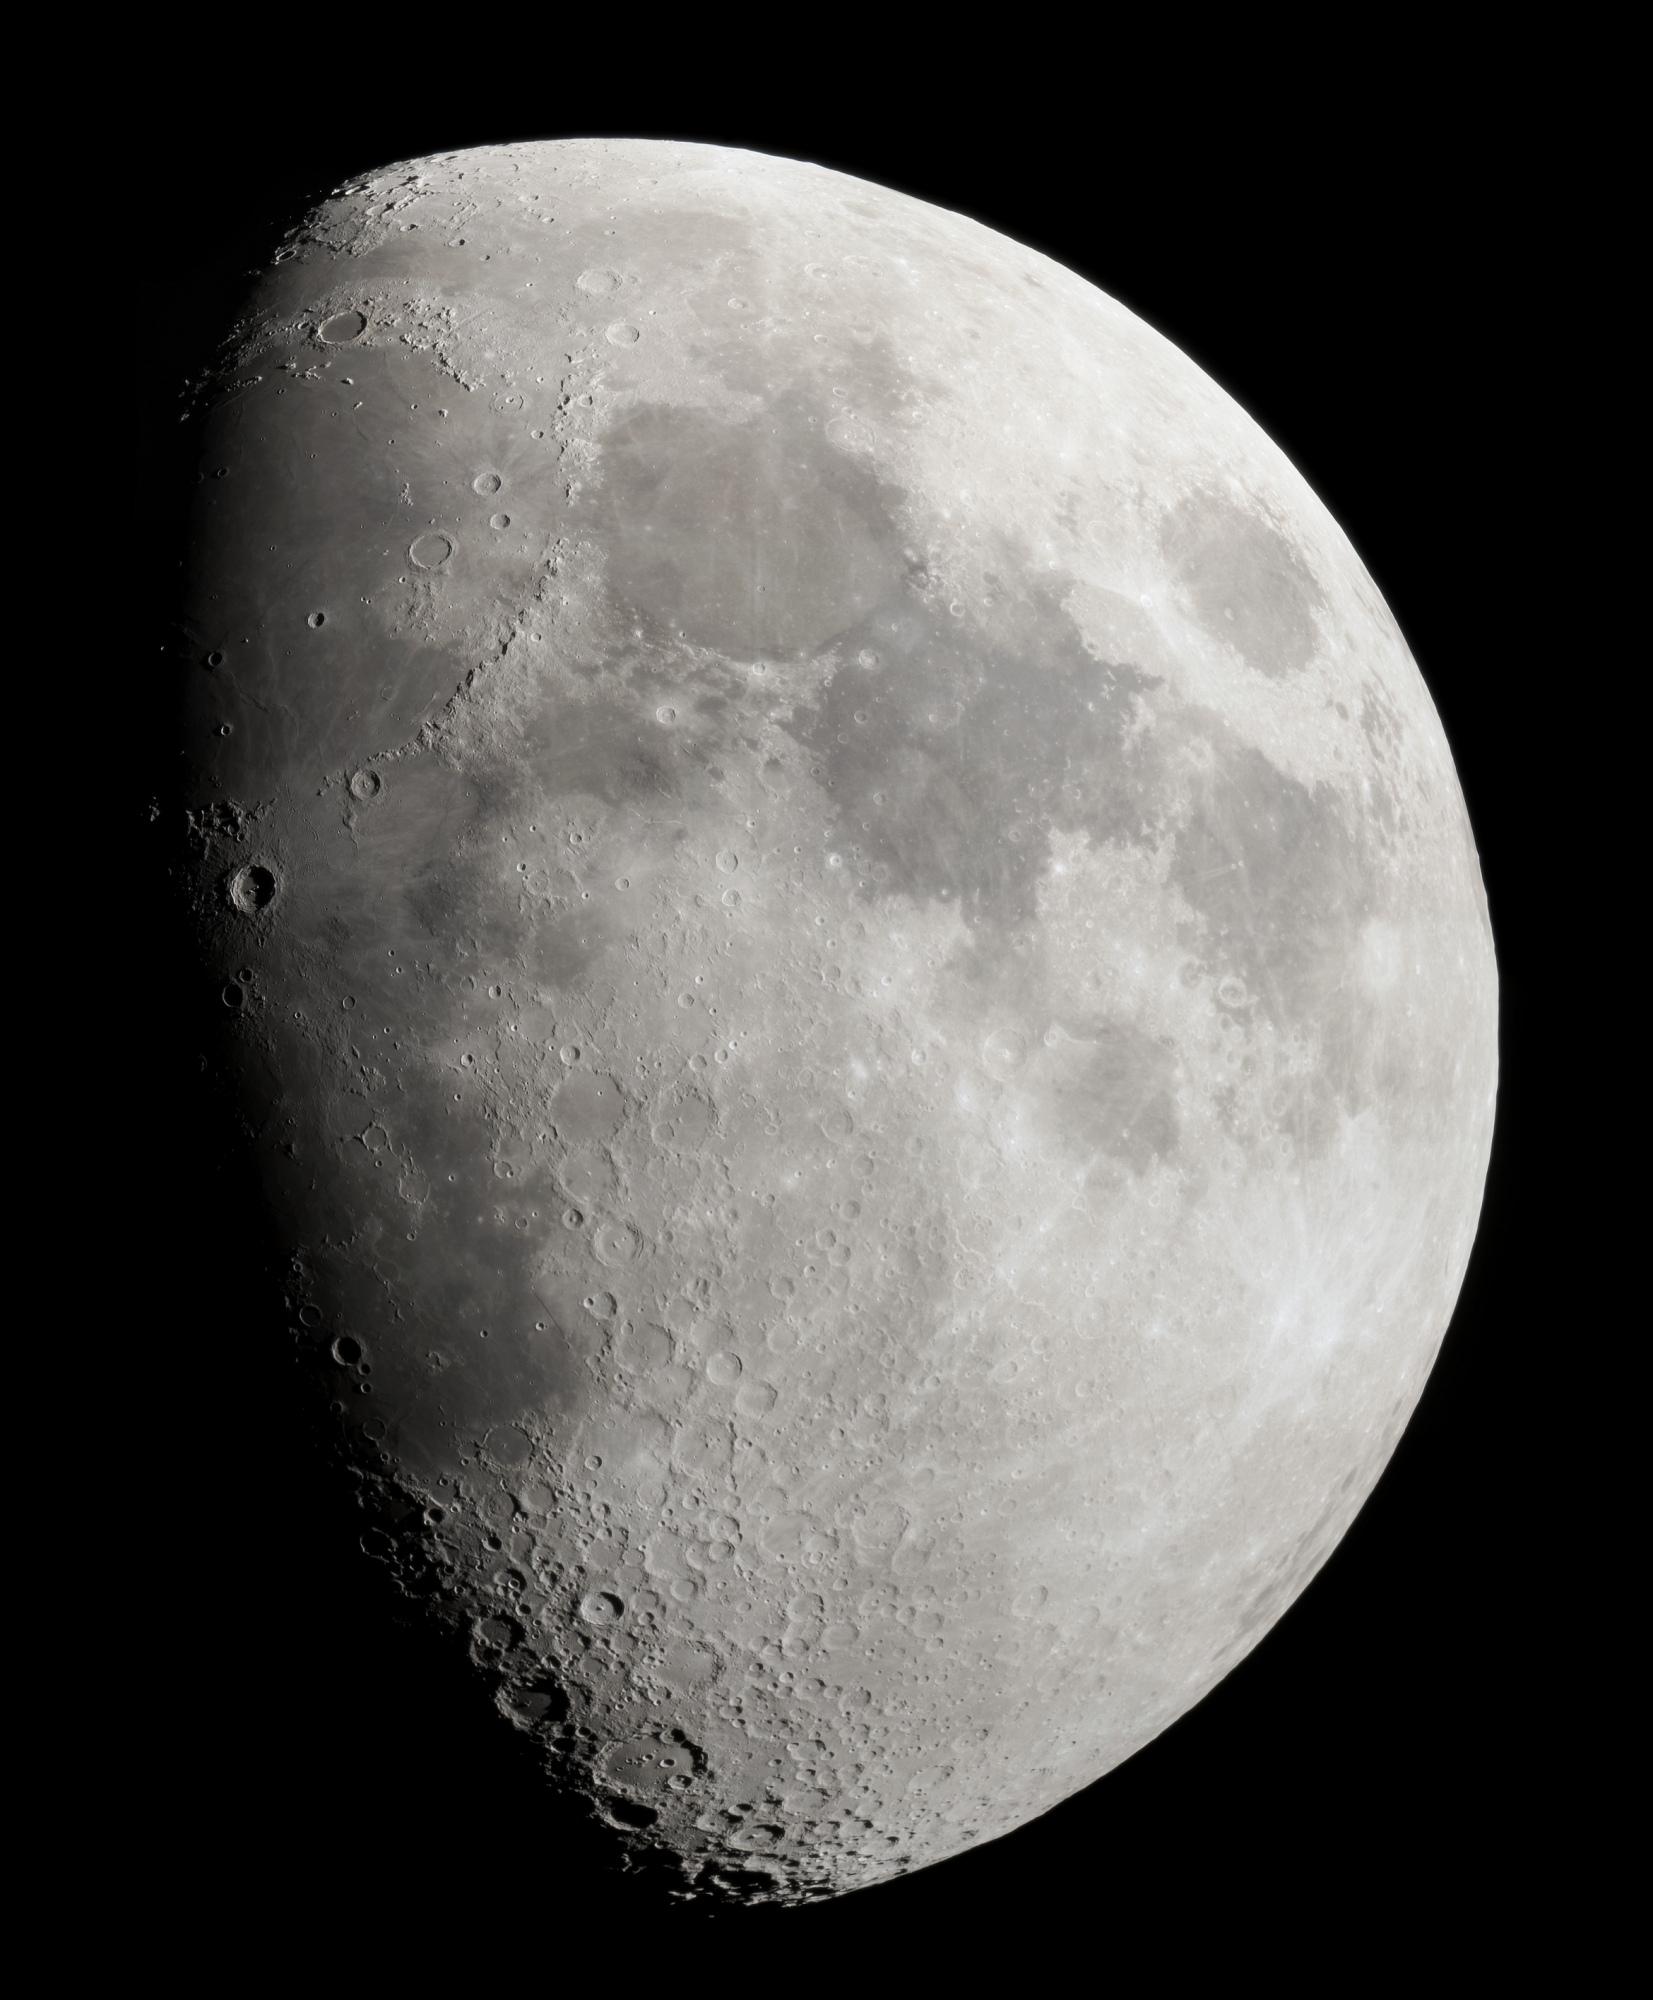 5ce15bcdbca26_lune130519(T250-B2x-A7s-60).thumb.jpg.3b304e6f5769f94e0644137daa45c034.jpg